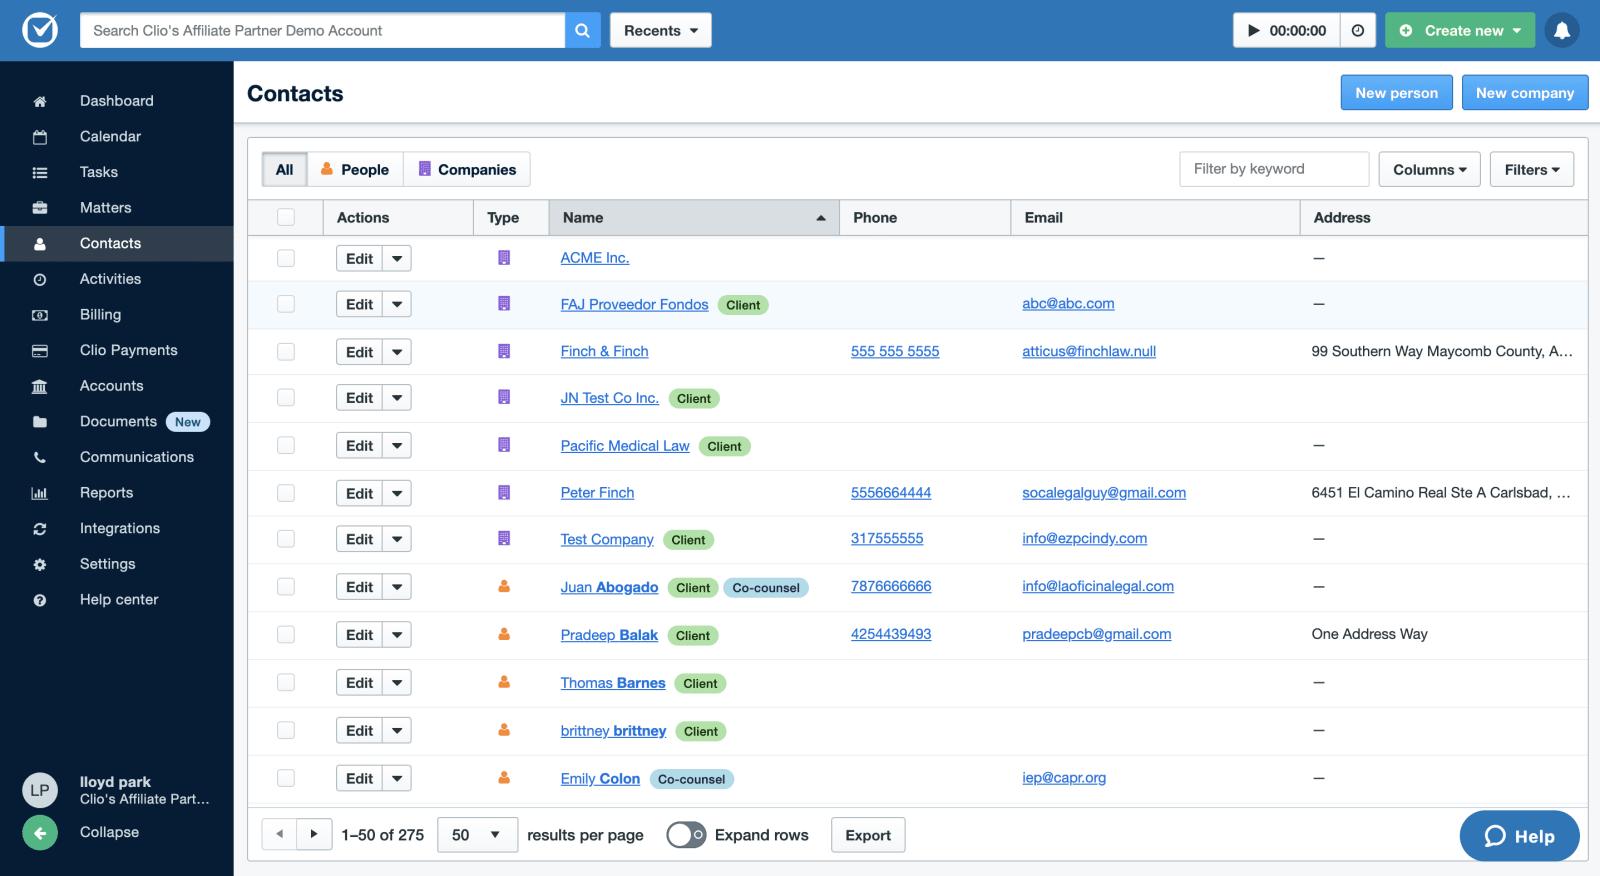 clio manage contact management image